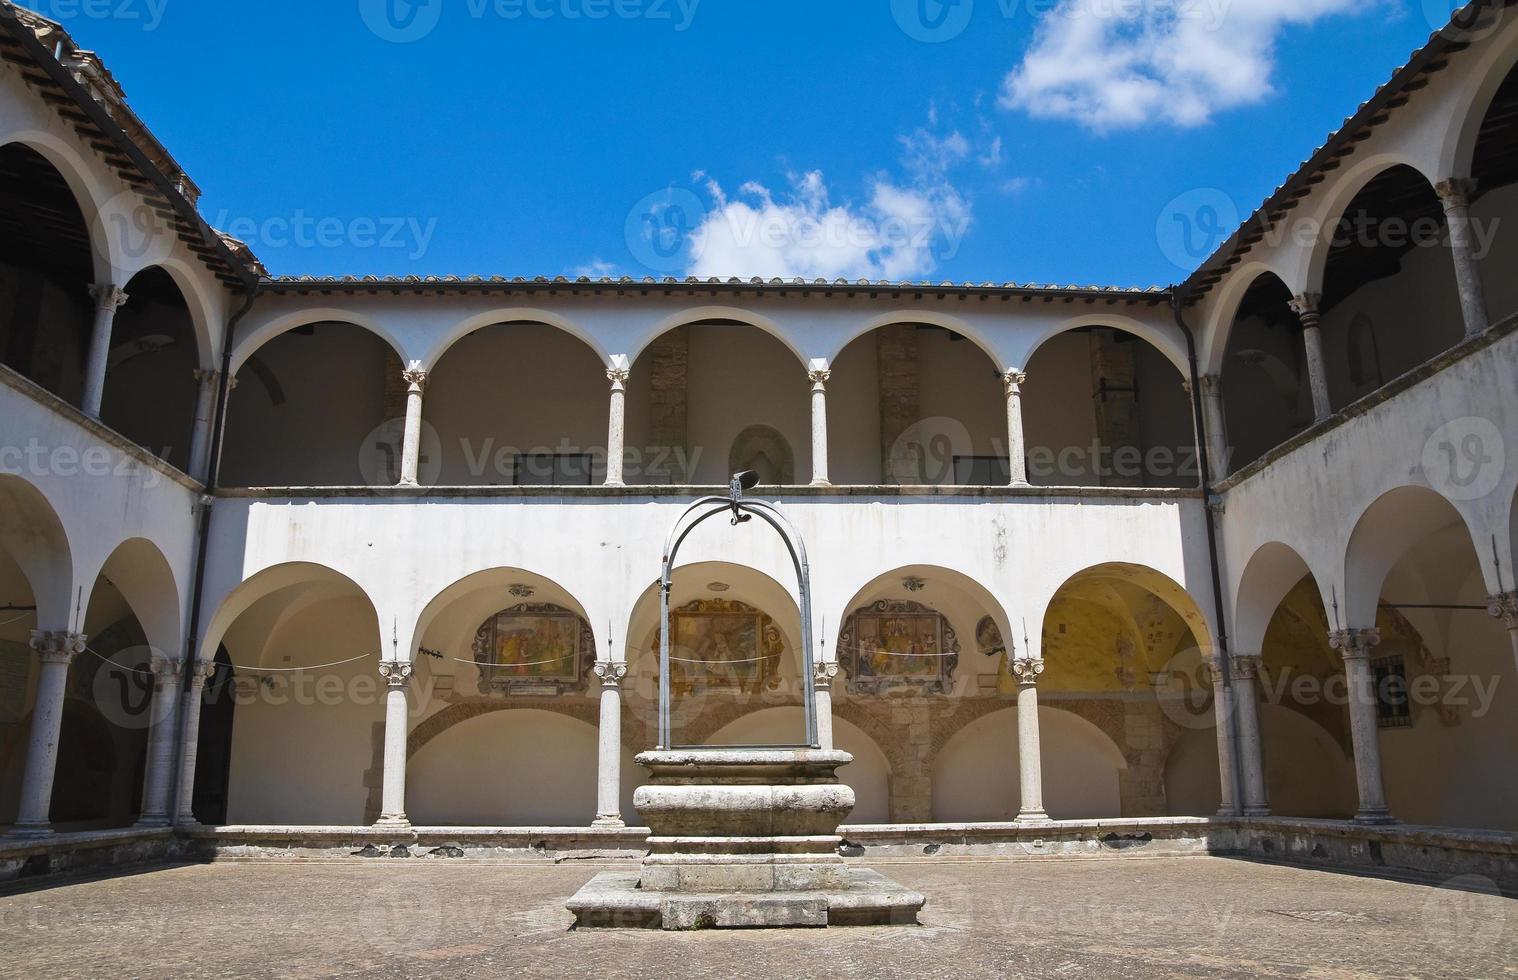 chiesa di st. Francesco. amelia. umbria. Italia. foto